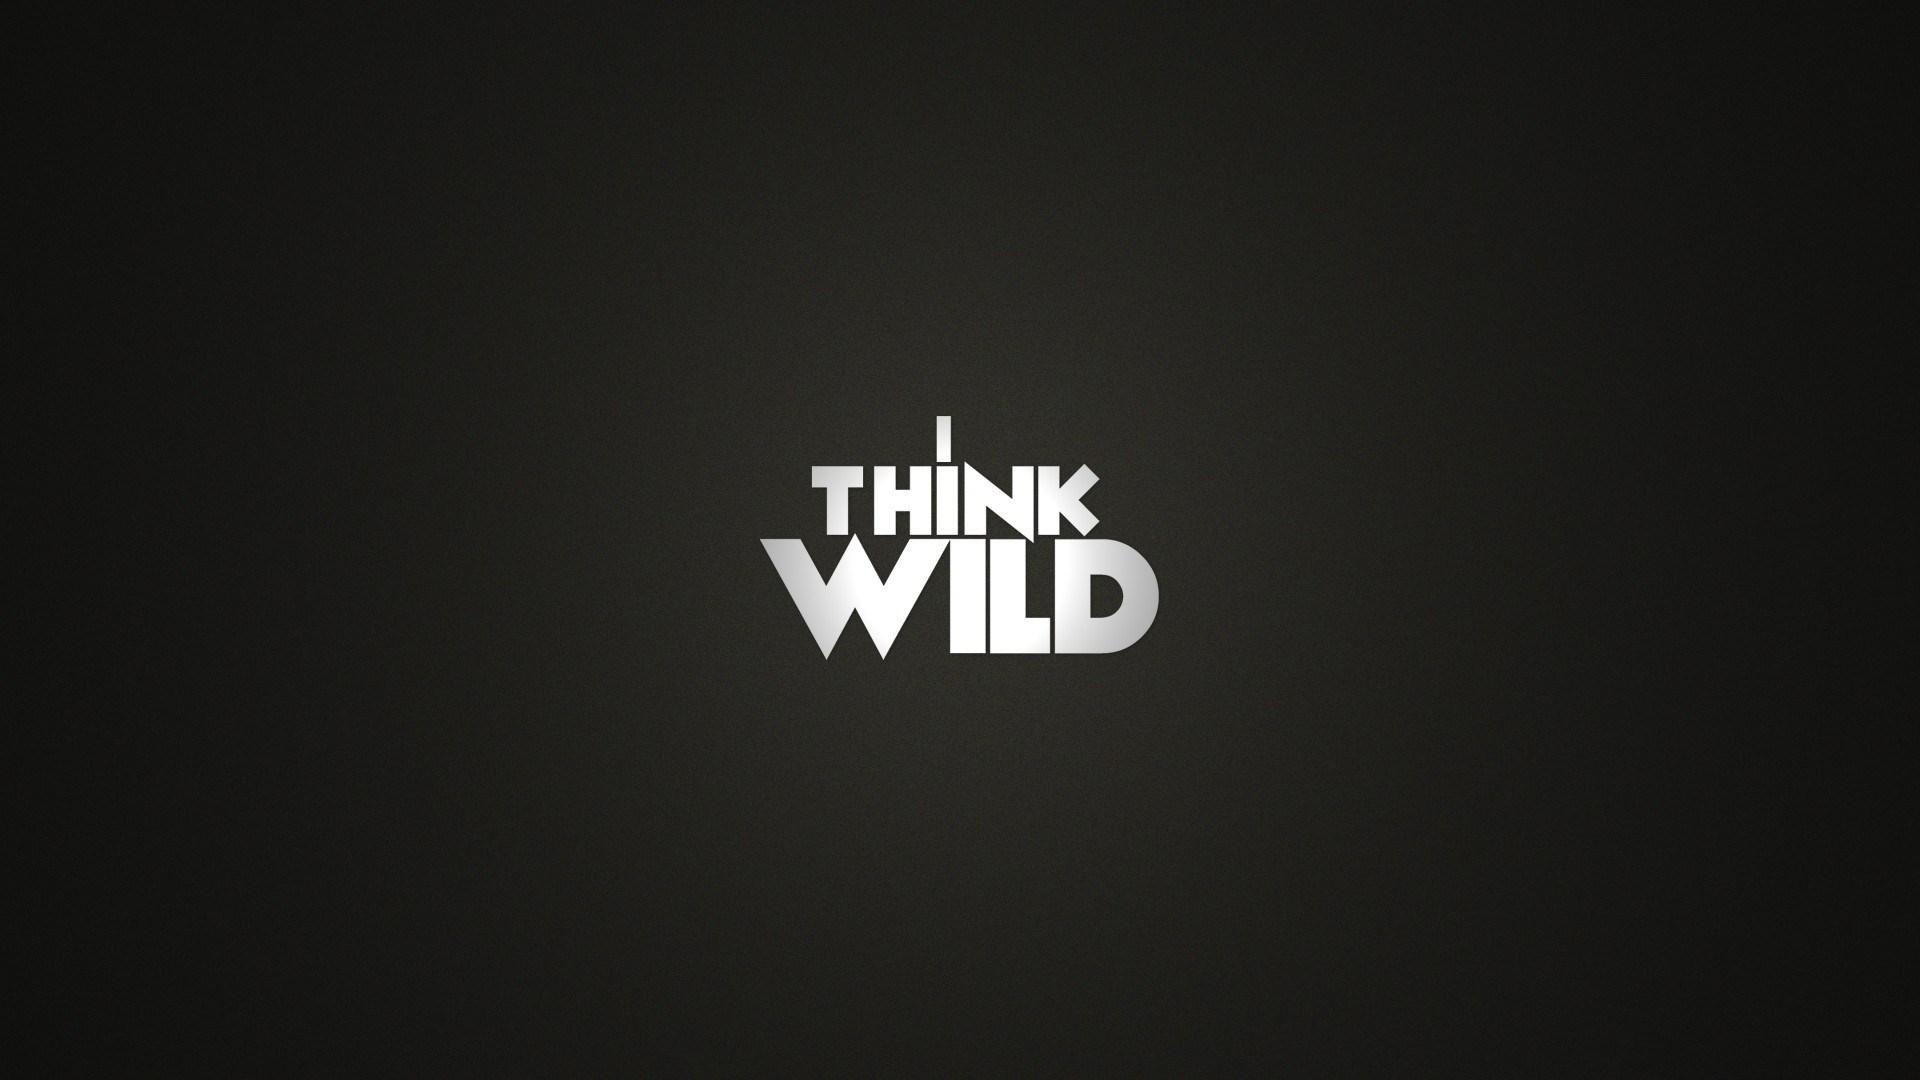 I Think Wild Text Creative Wallpaper 1920x1080 9380